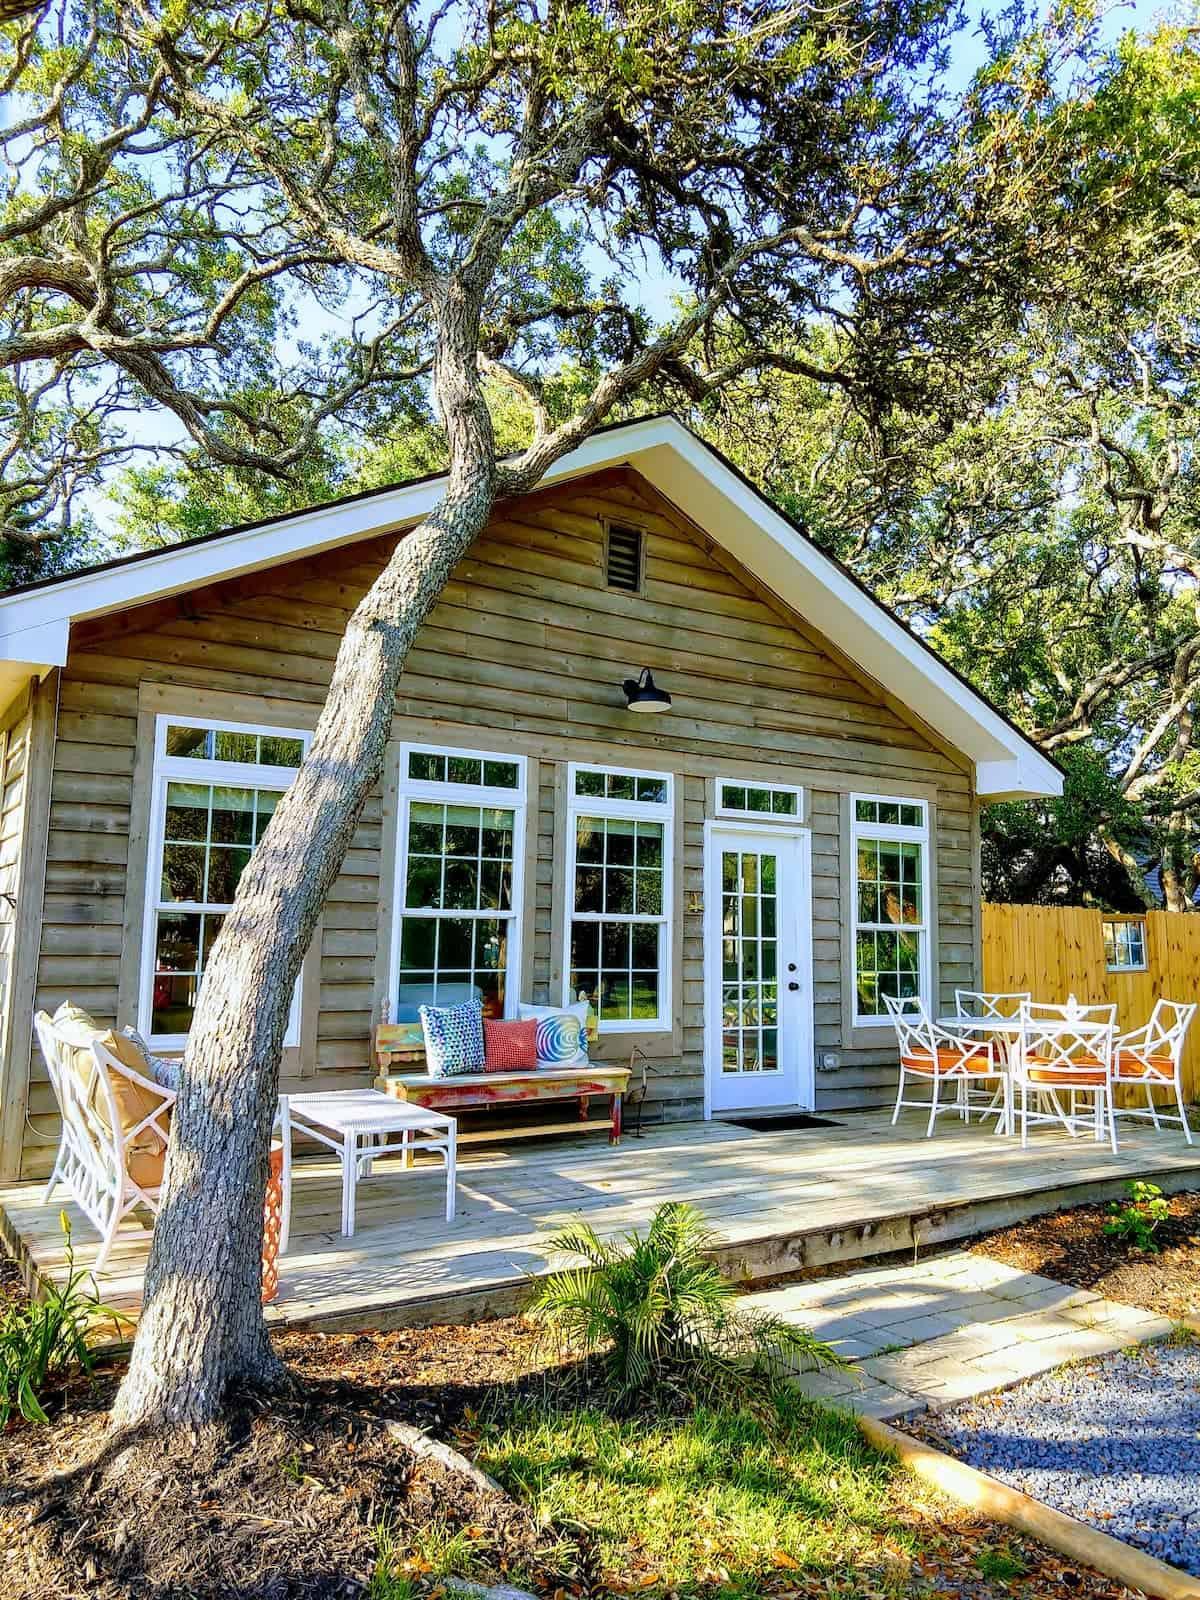 Image of beachfront rental in North Carolina